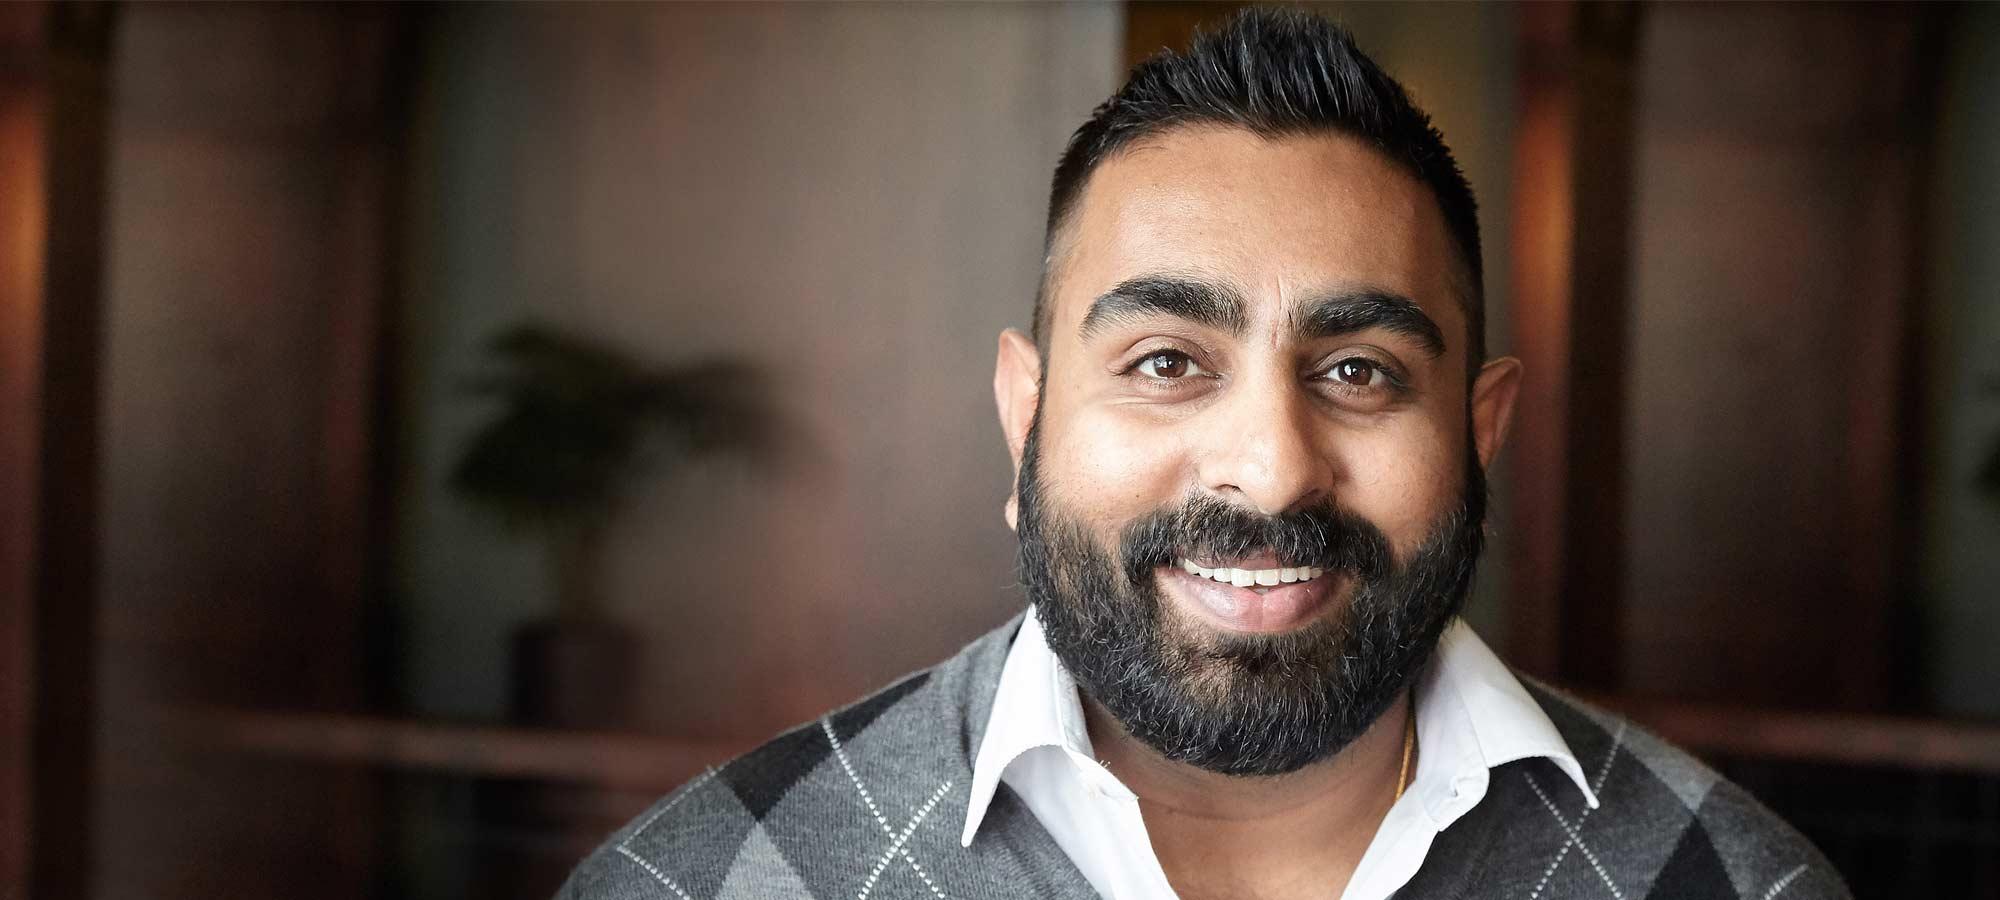 Aben Samual, Senior Solution Architect - Microsoft Azure, Equinox IT